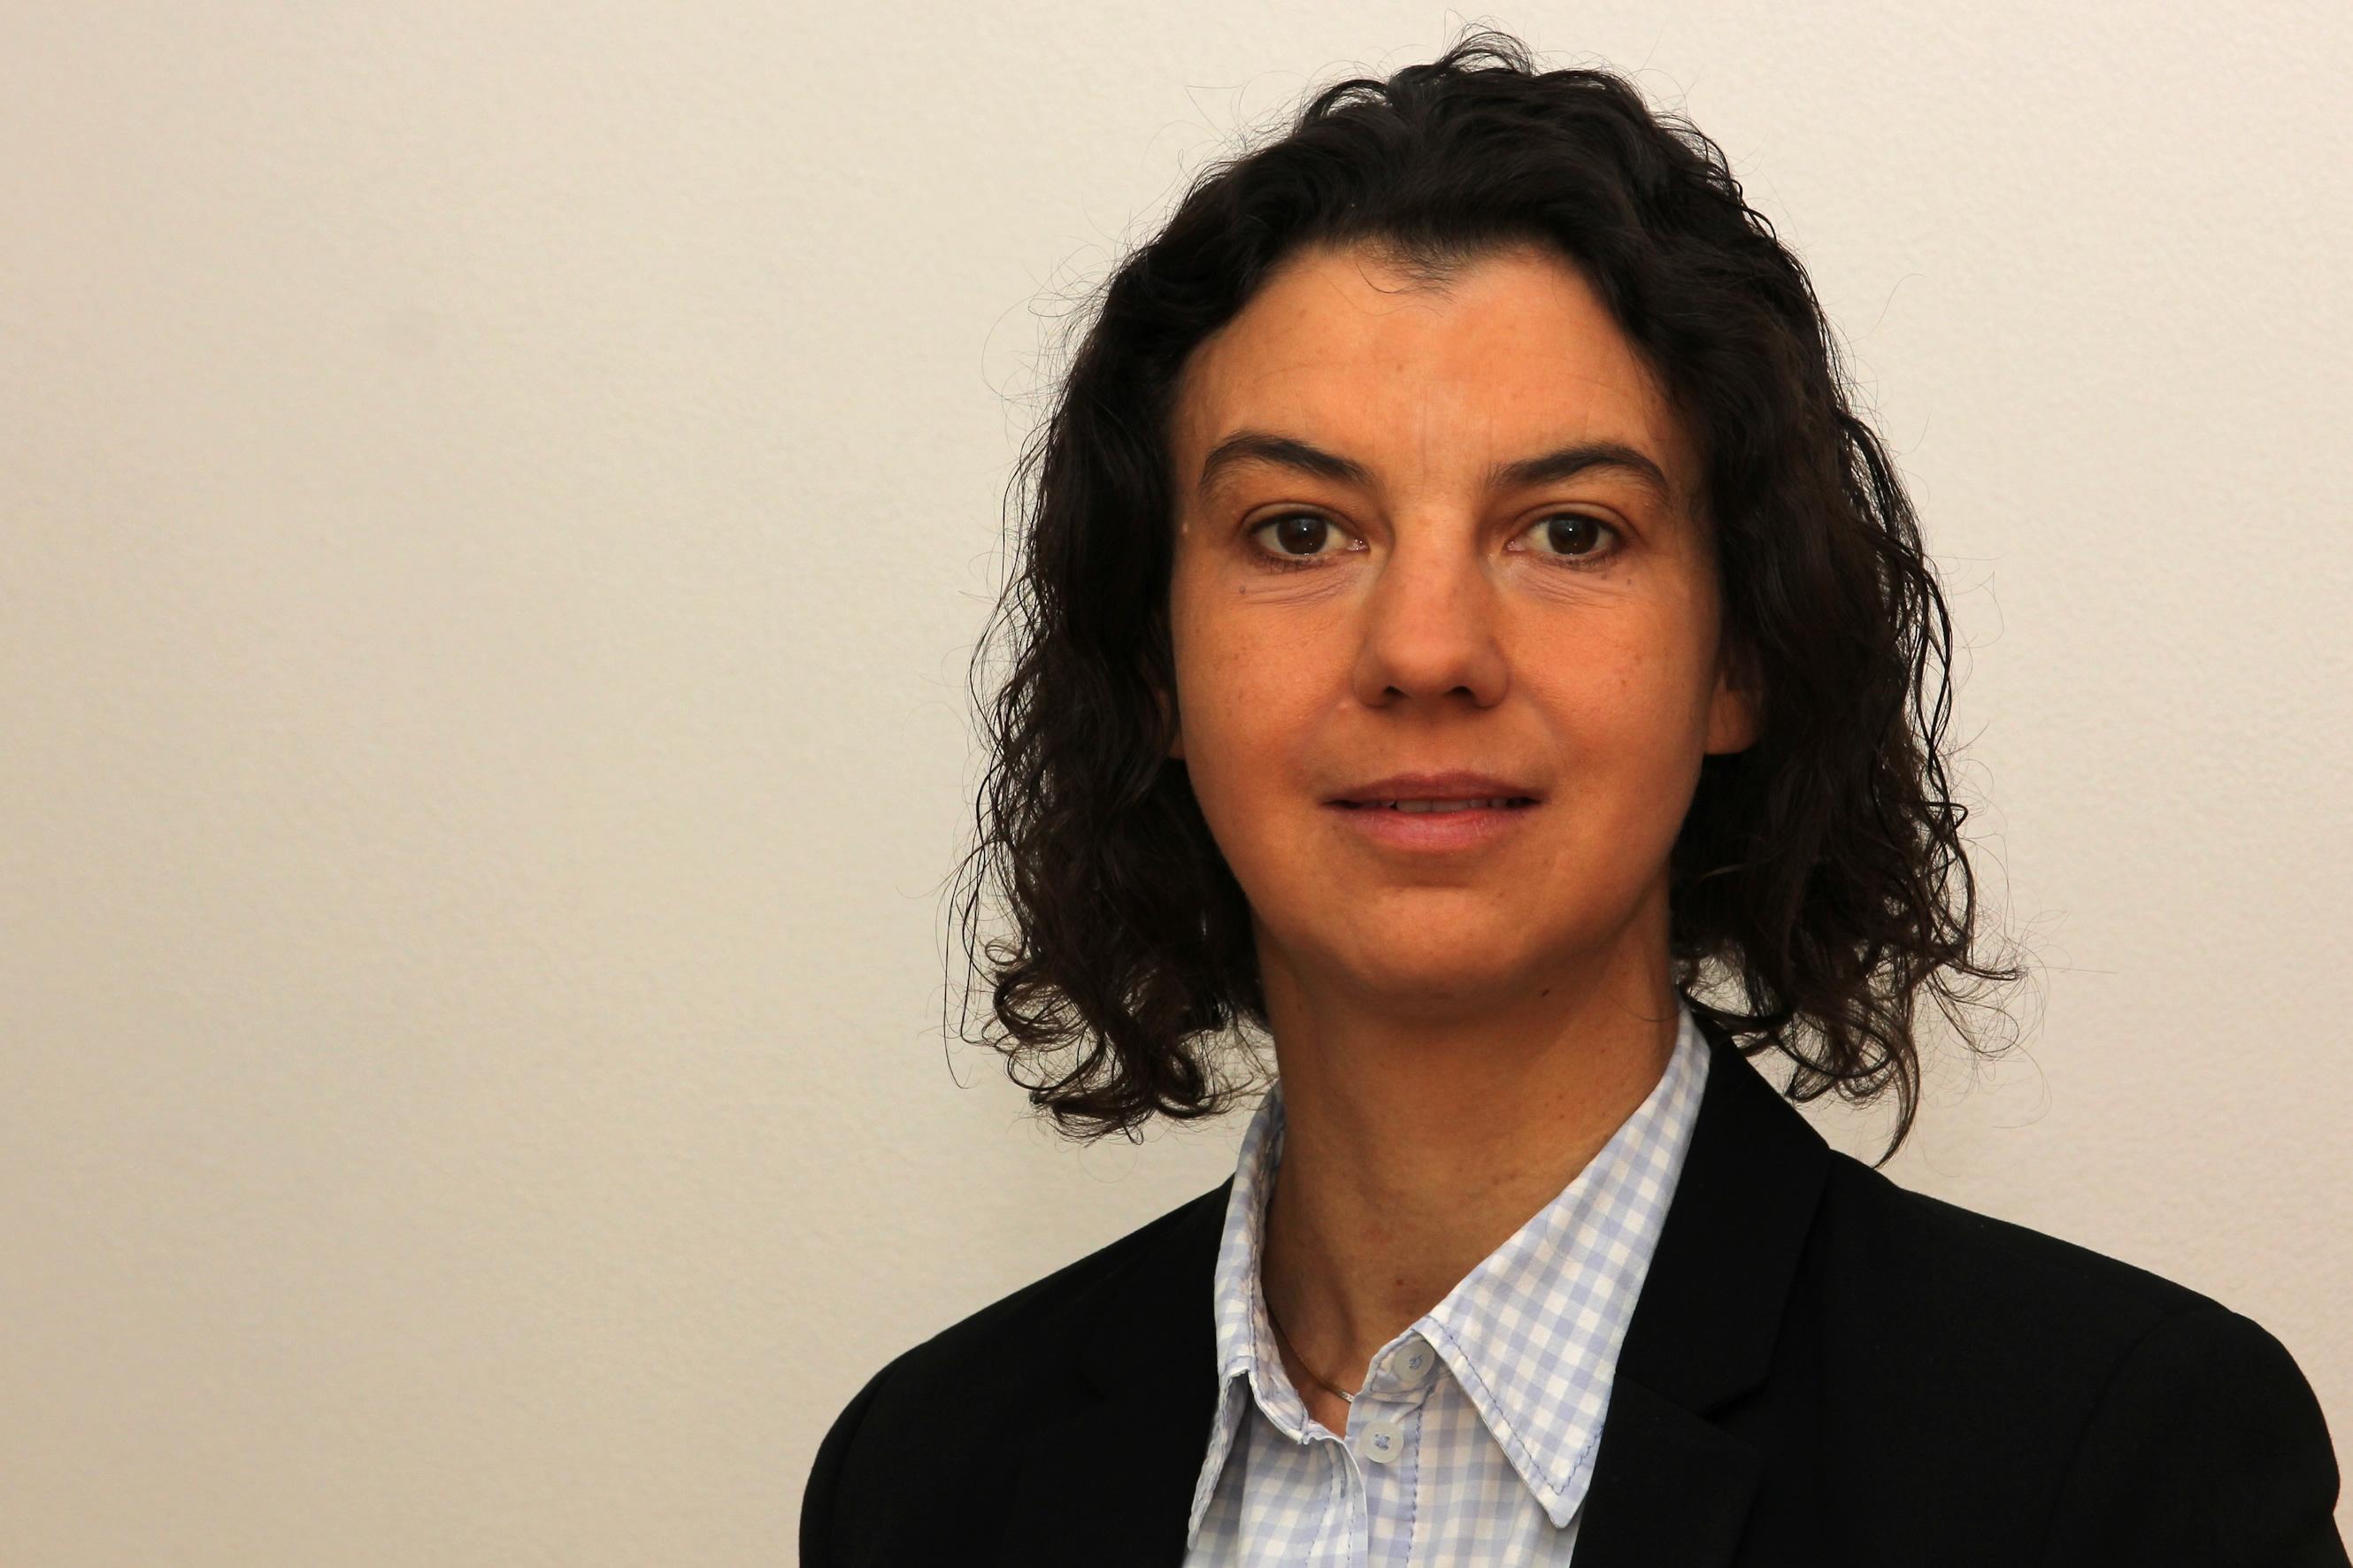 Karin Hausdorf